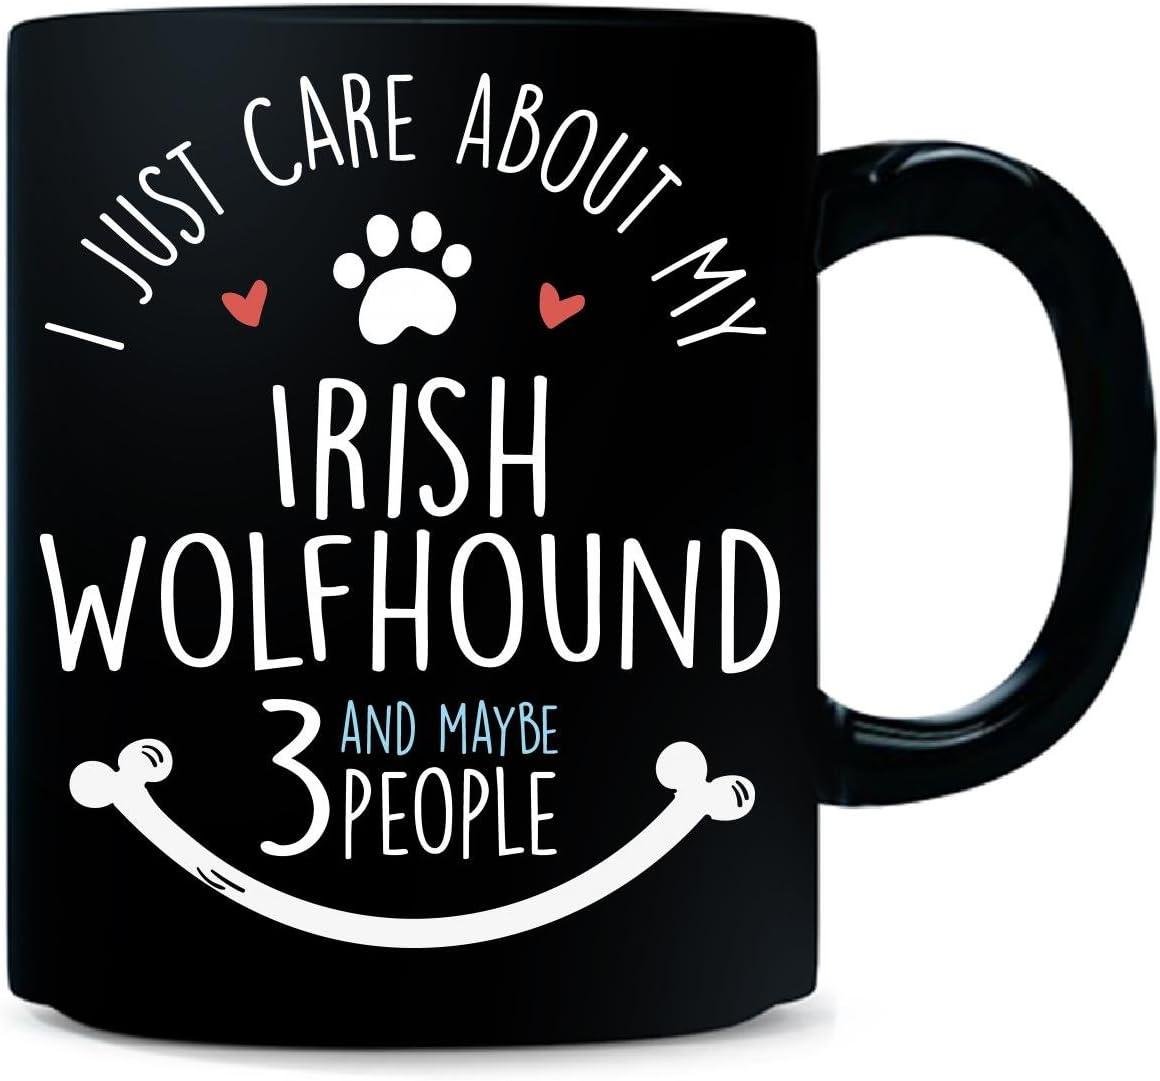 Cute funny gifts for Irish Wolfhound dog owners lovers! Irish Wolfhound Mum Mug